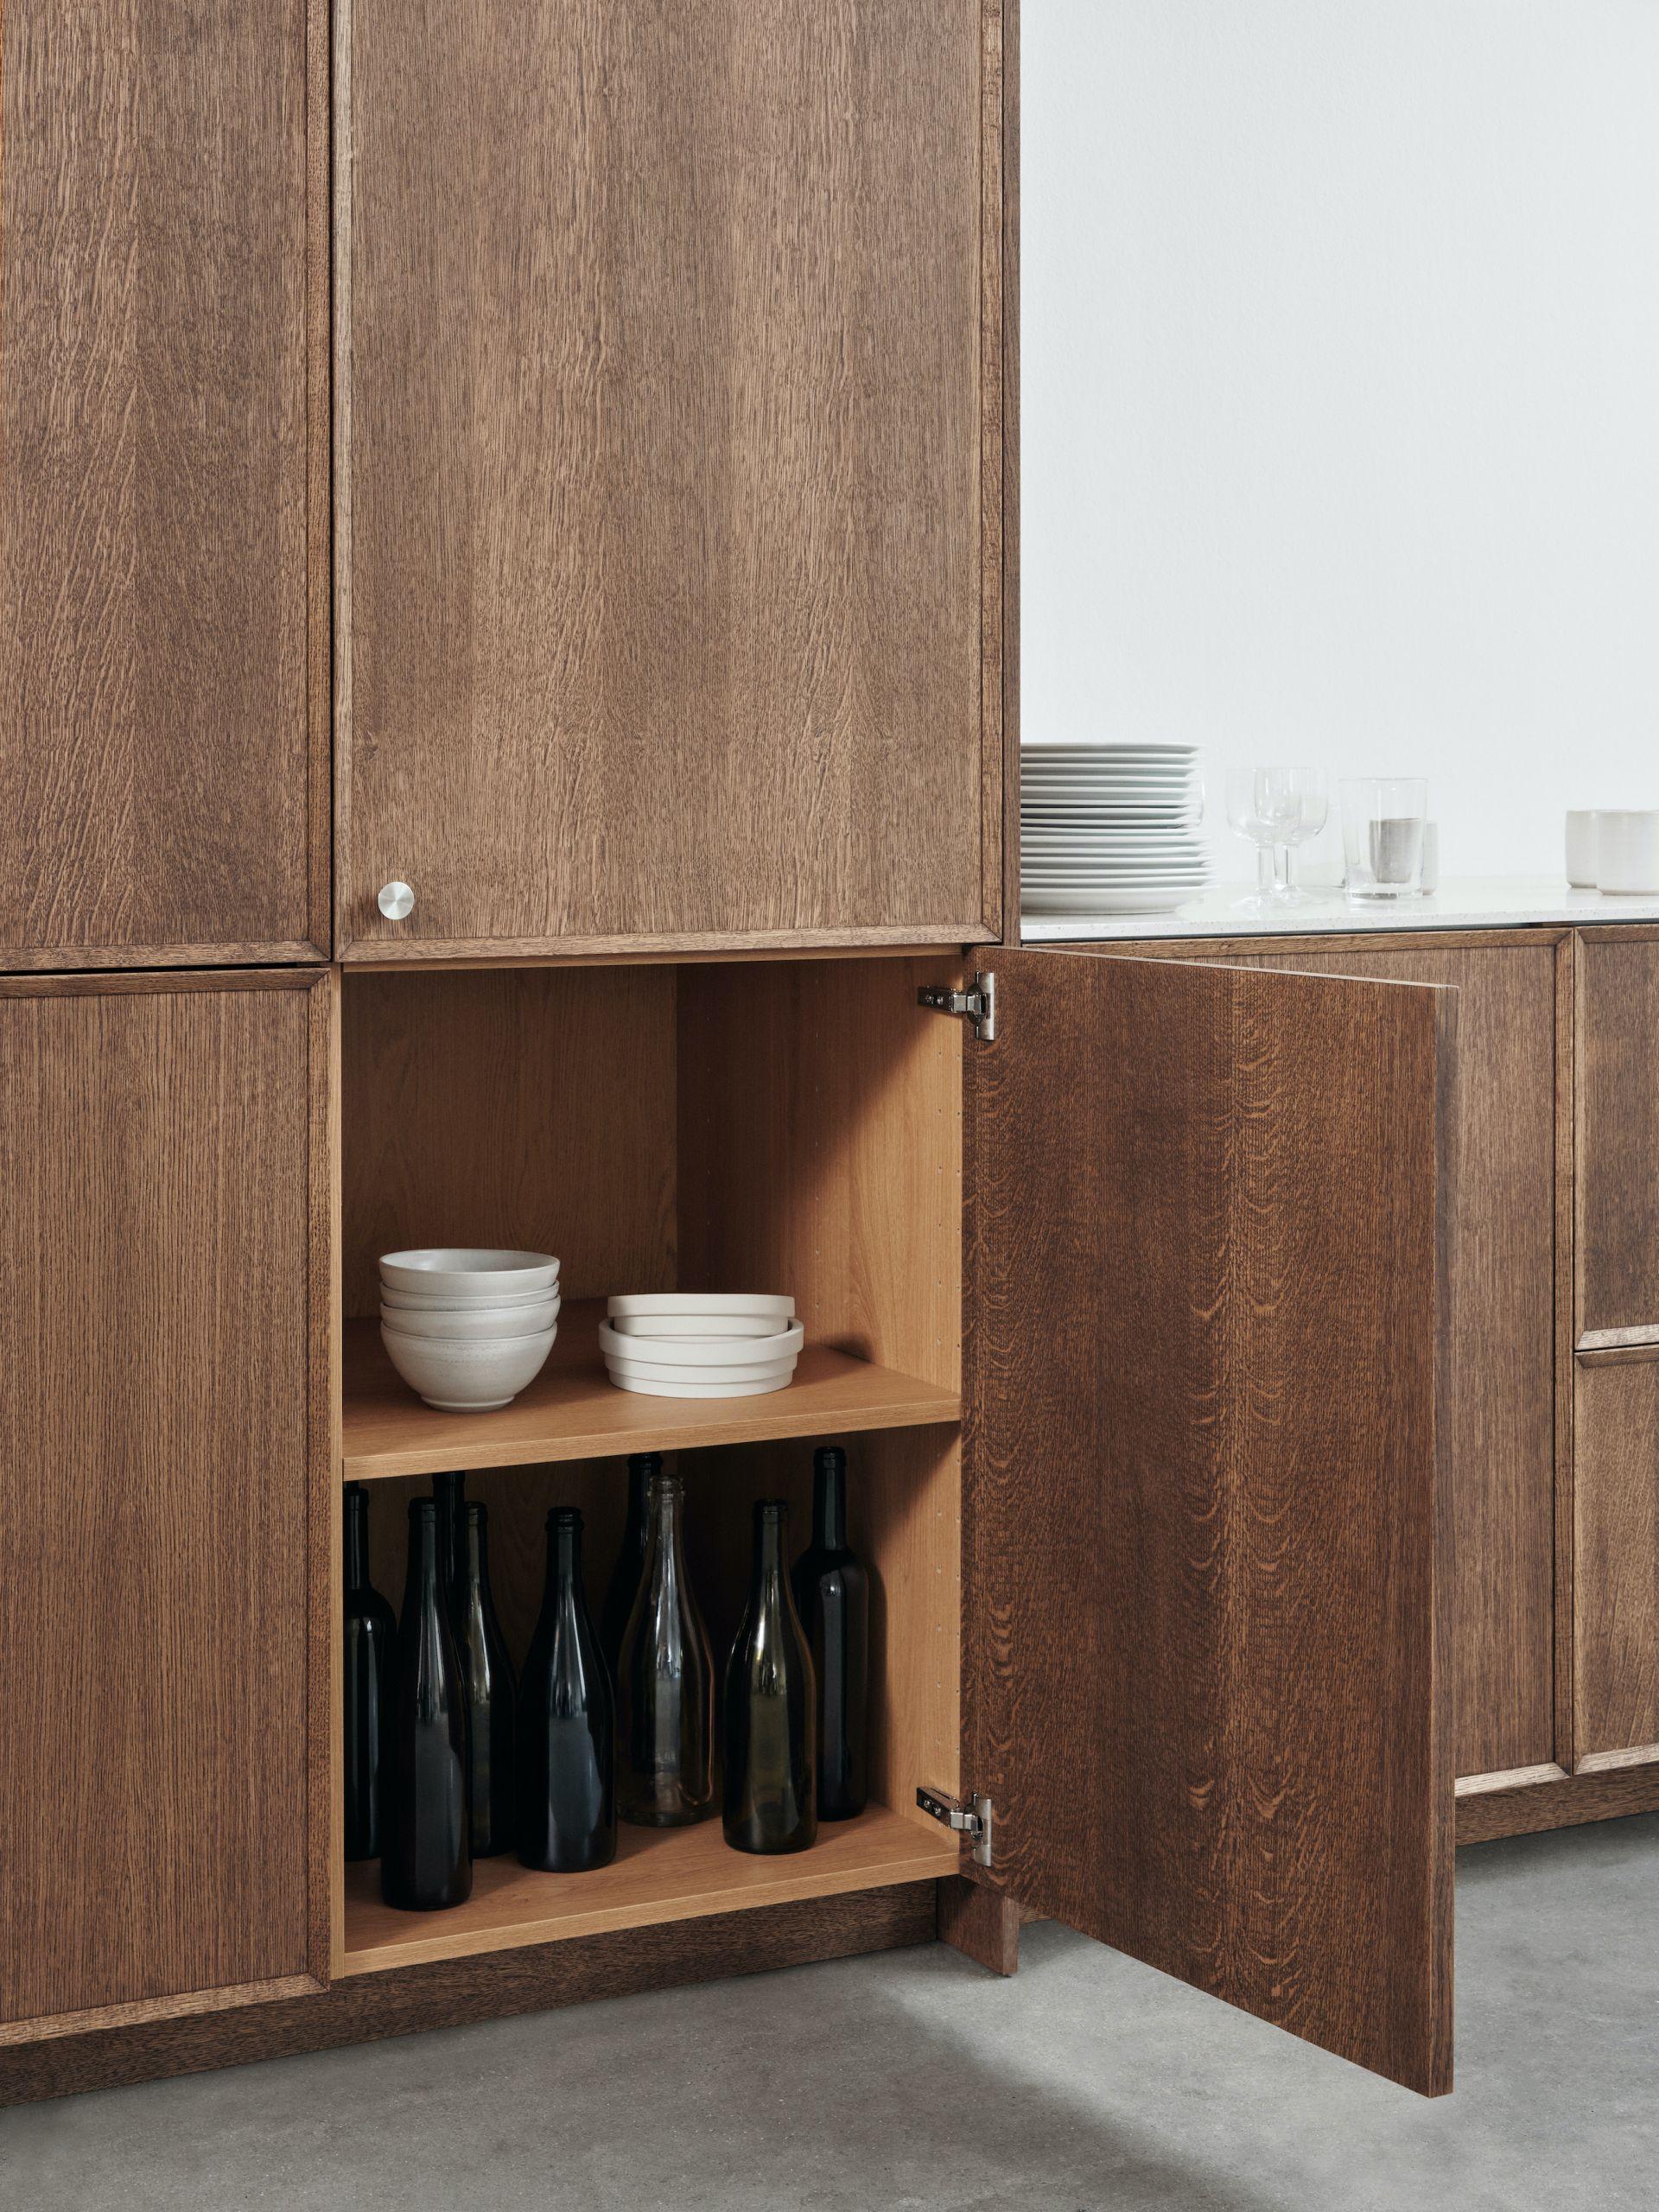 Reform cph Modernes Küchendesign - Love Daily Dose